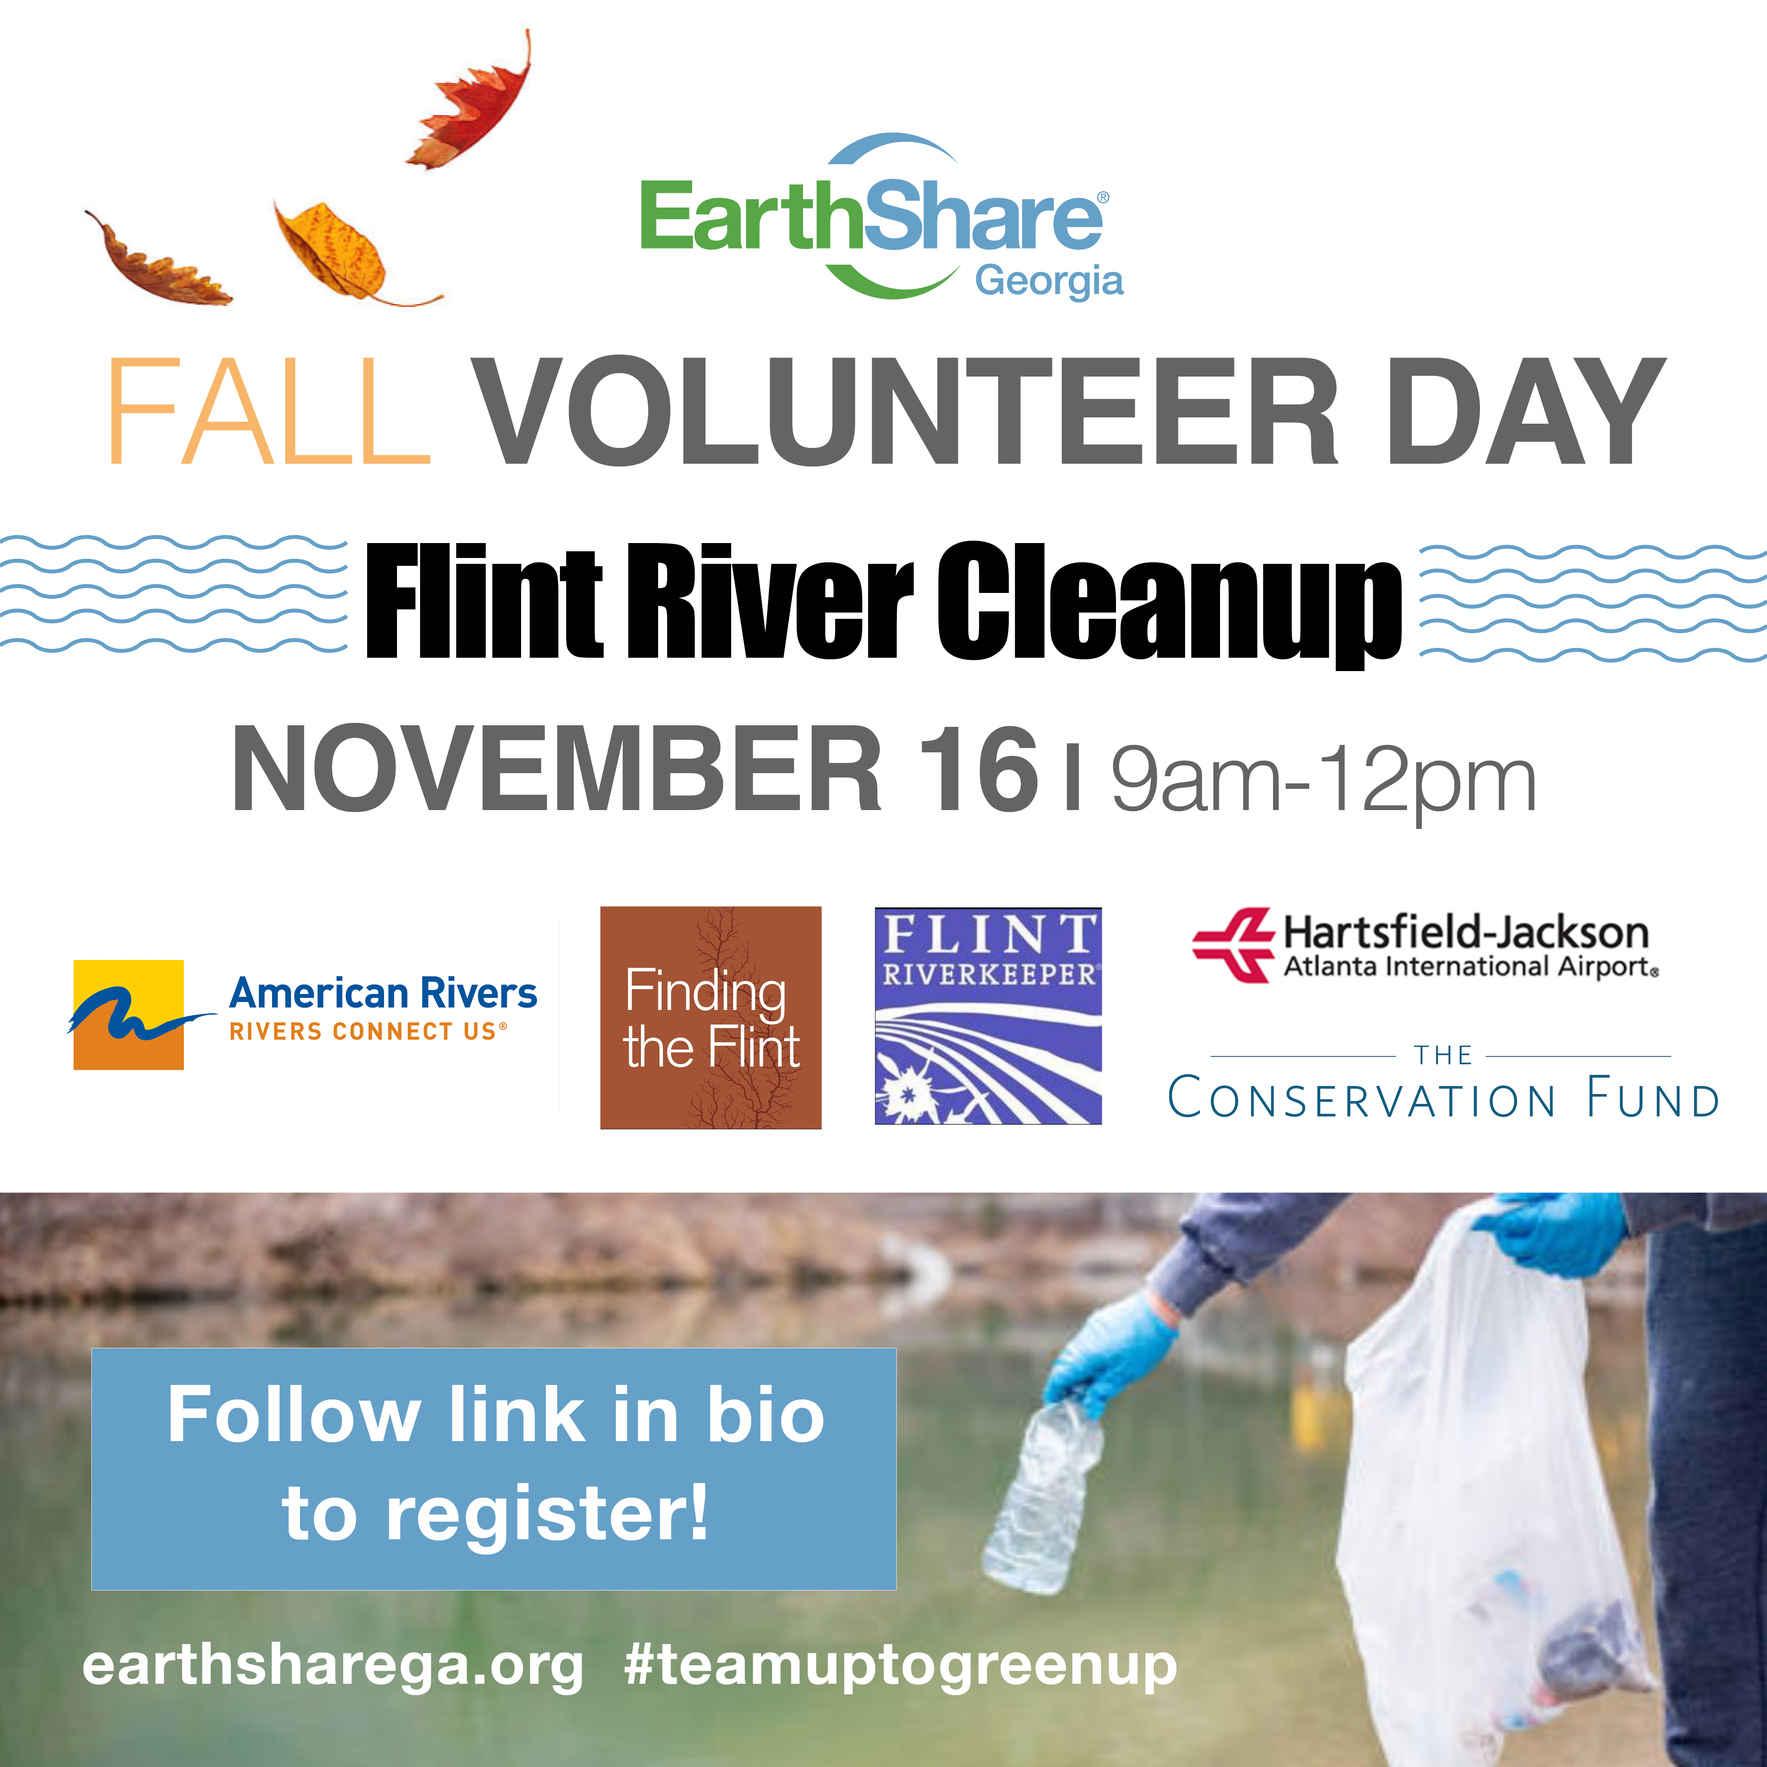 EarthShare Georgia 2019 Fall Volunteer Day  image